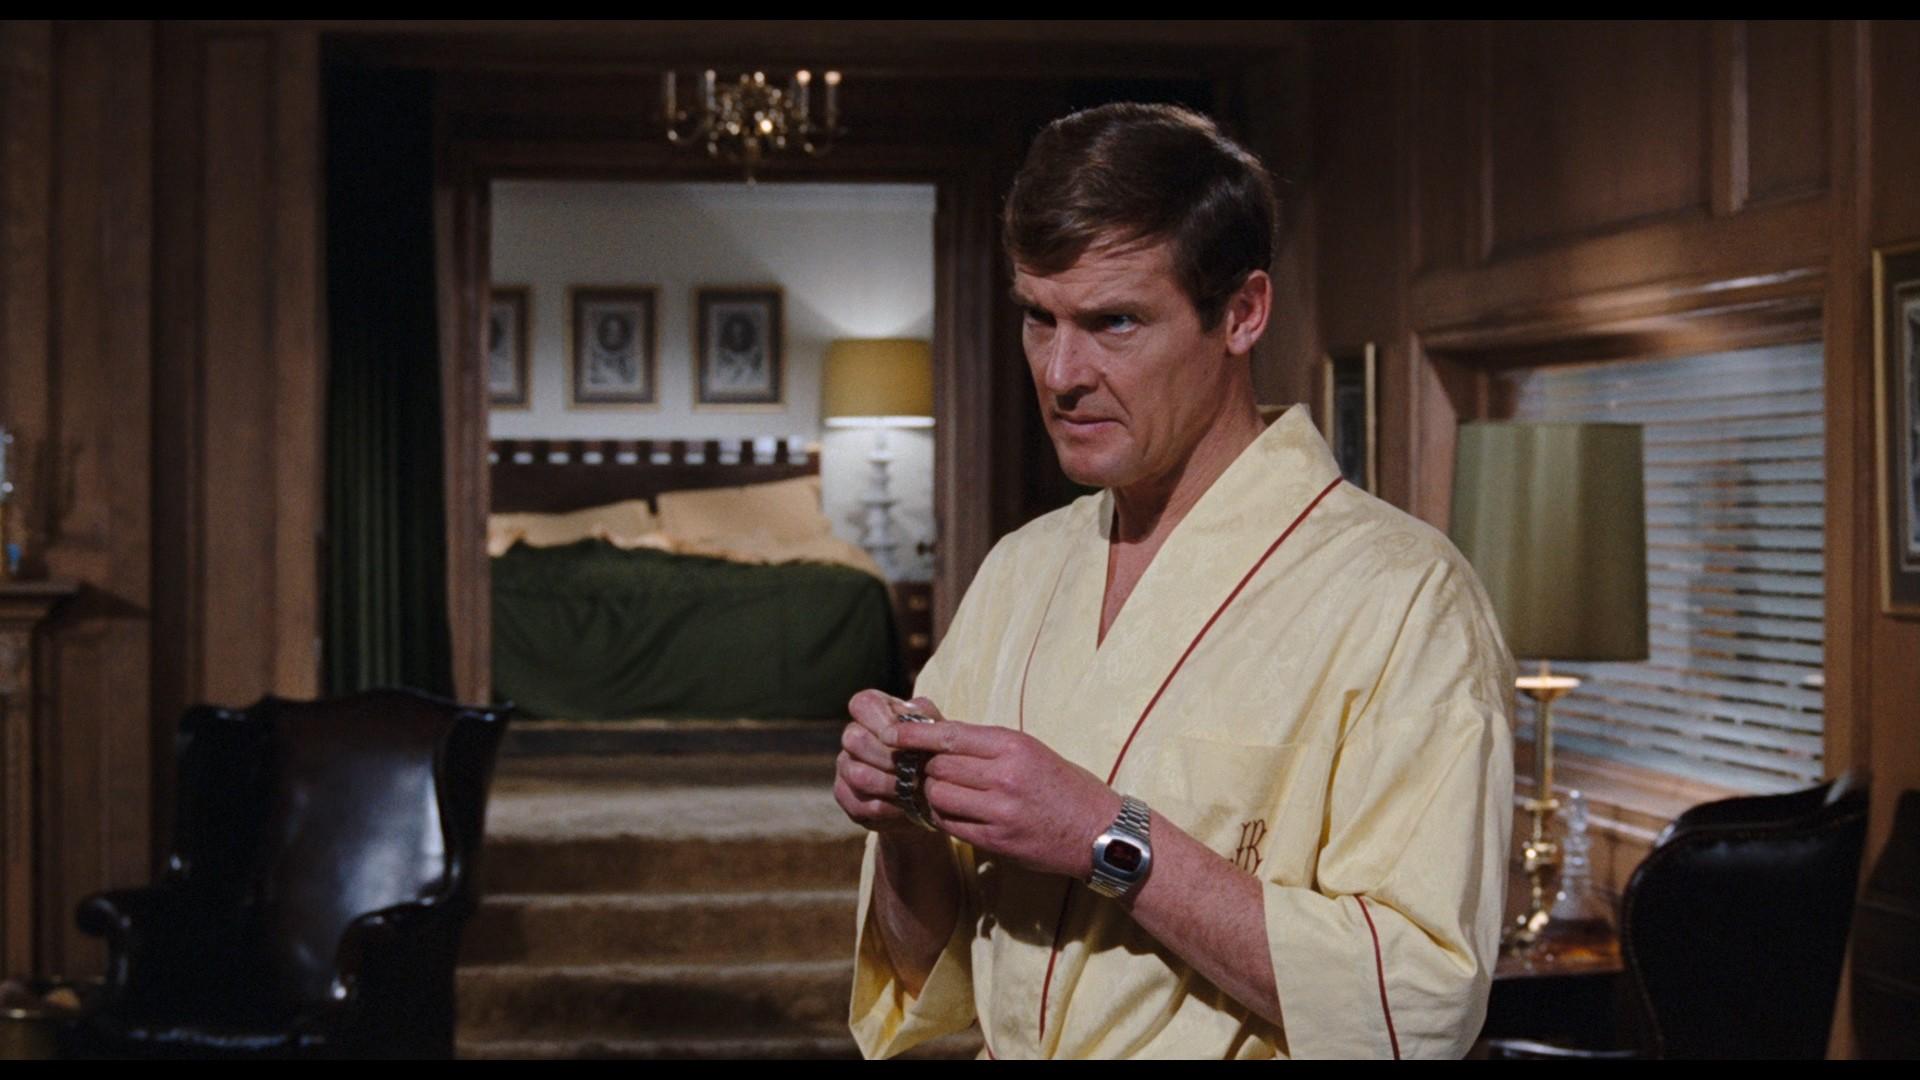 JAMES BOND: LIVE AND LET DIE (1973) - James Bond's (Roger Moore) Hamilton Pulsar Watch, On-set Photo - Image 12 of 13